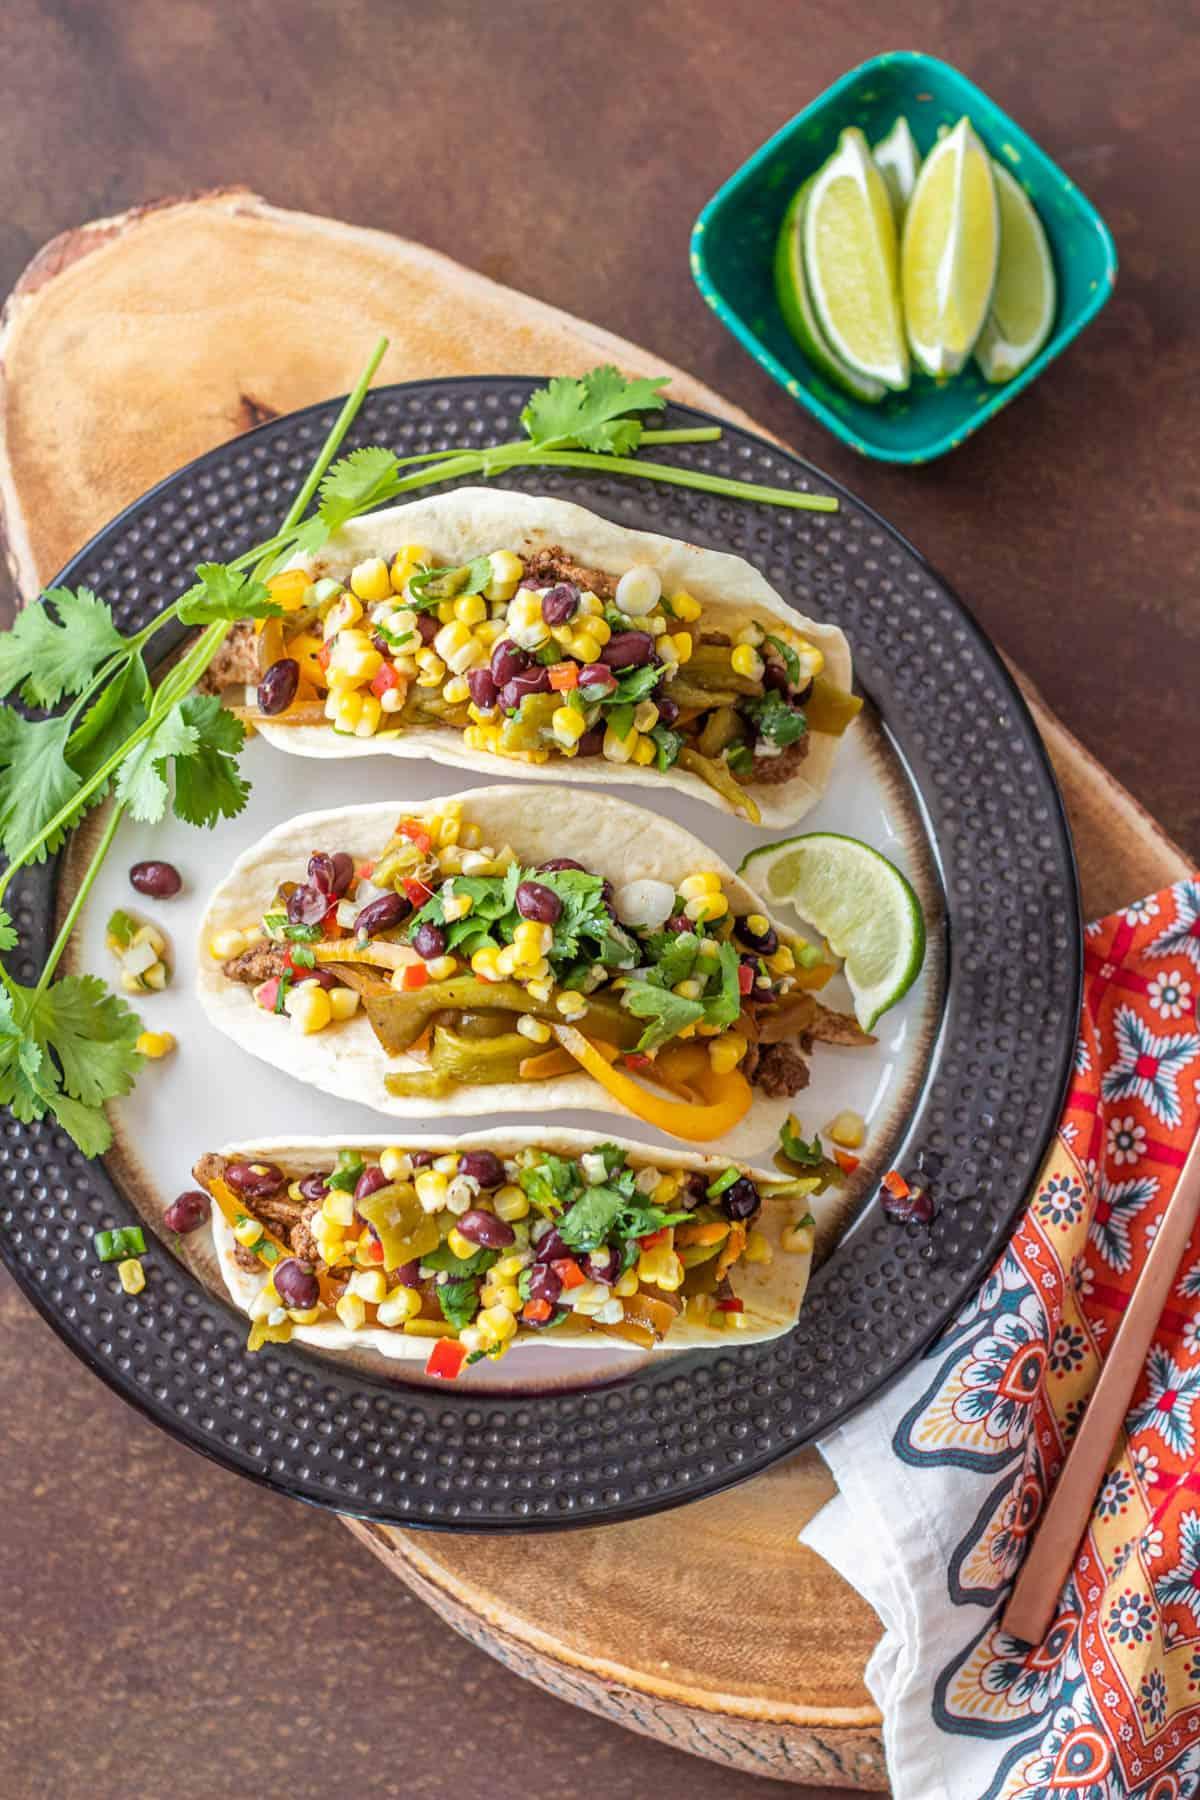 A bronze ceramic plate with 3 pork fajita tacos with corn and black bean salsa.